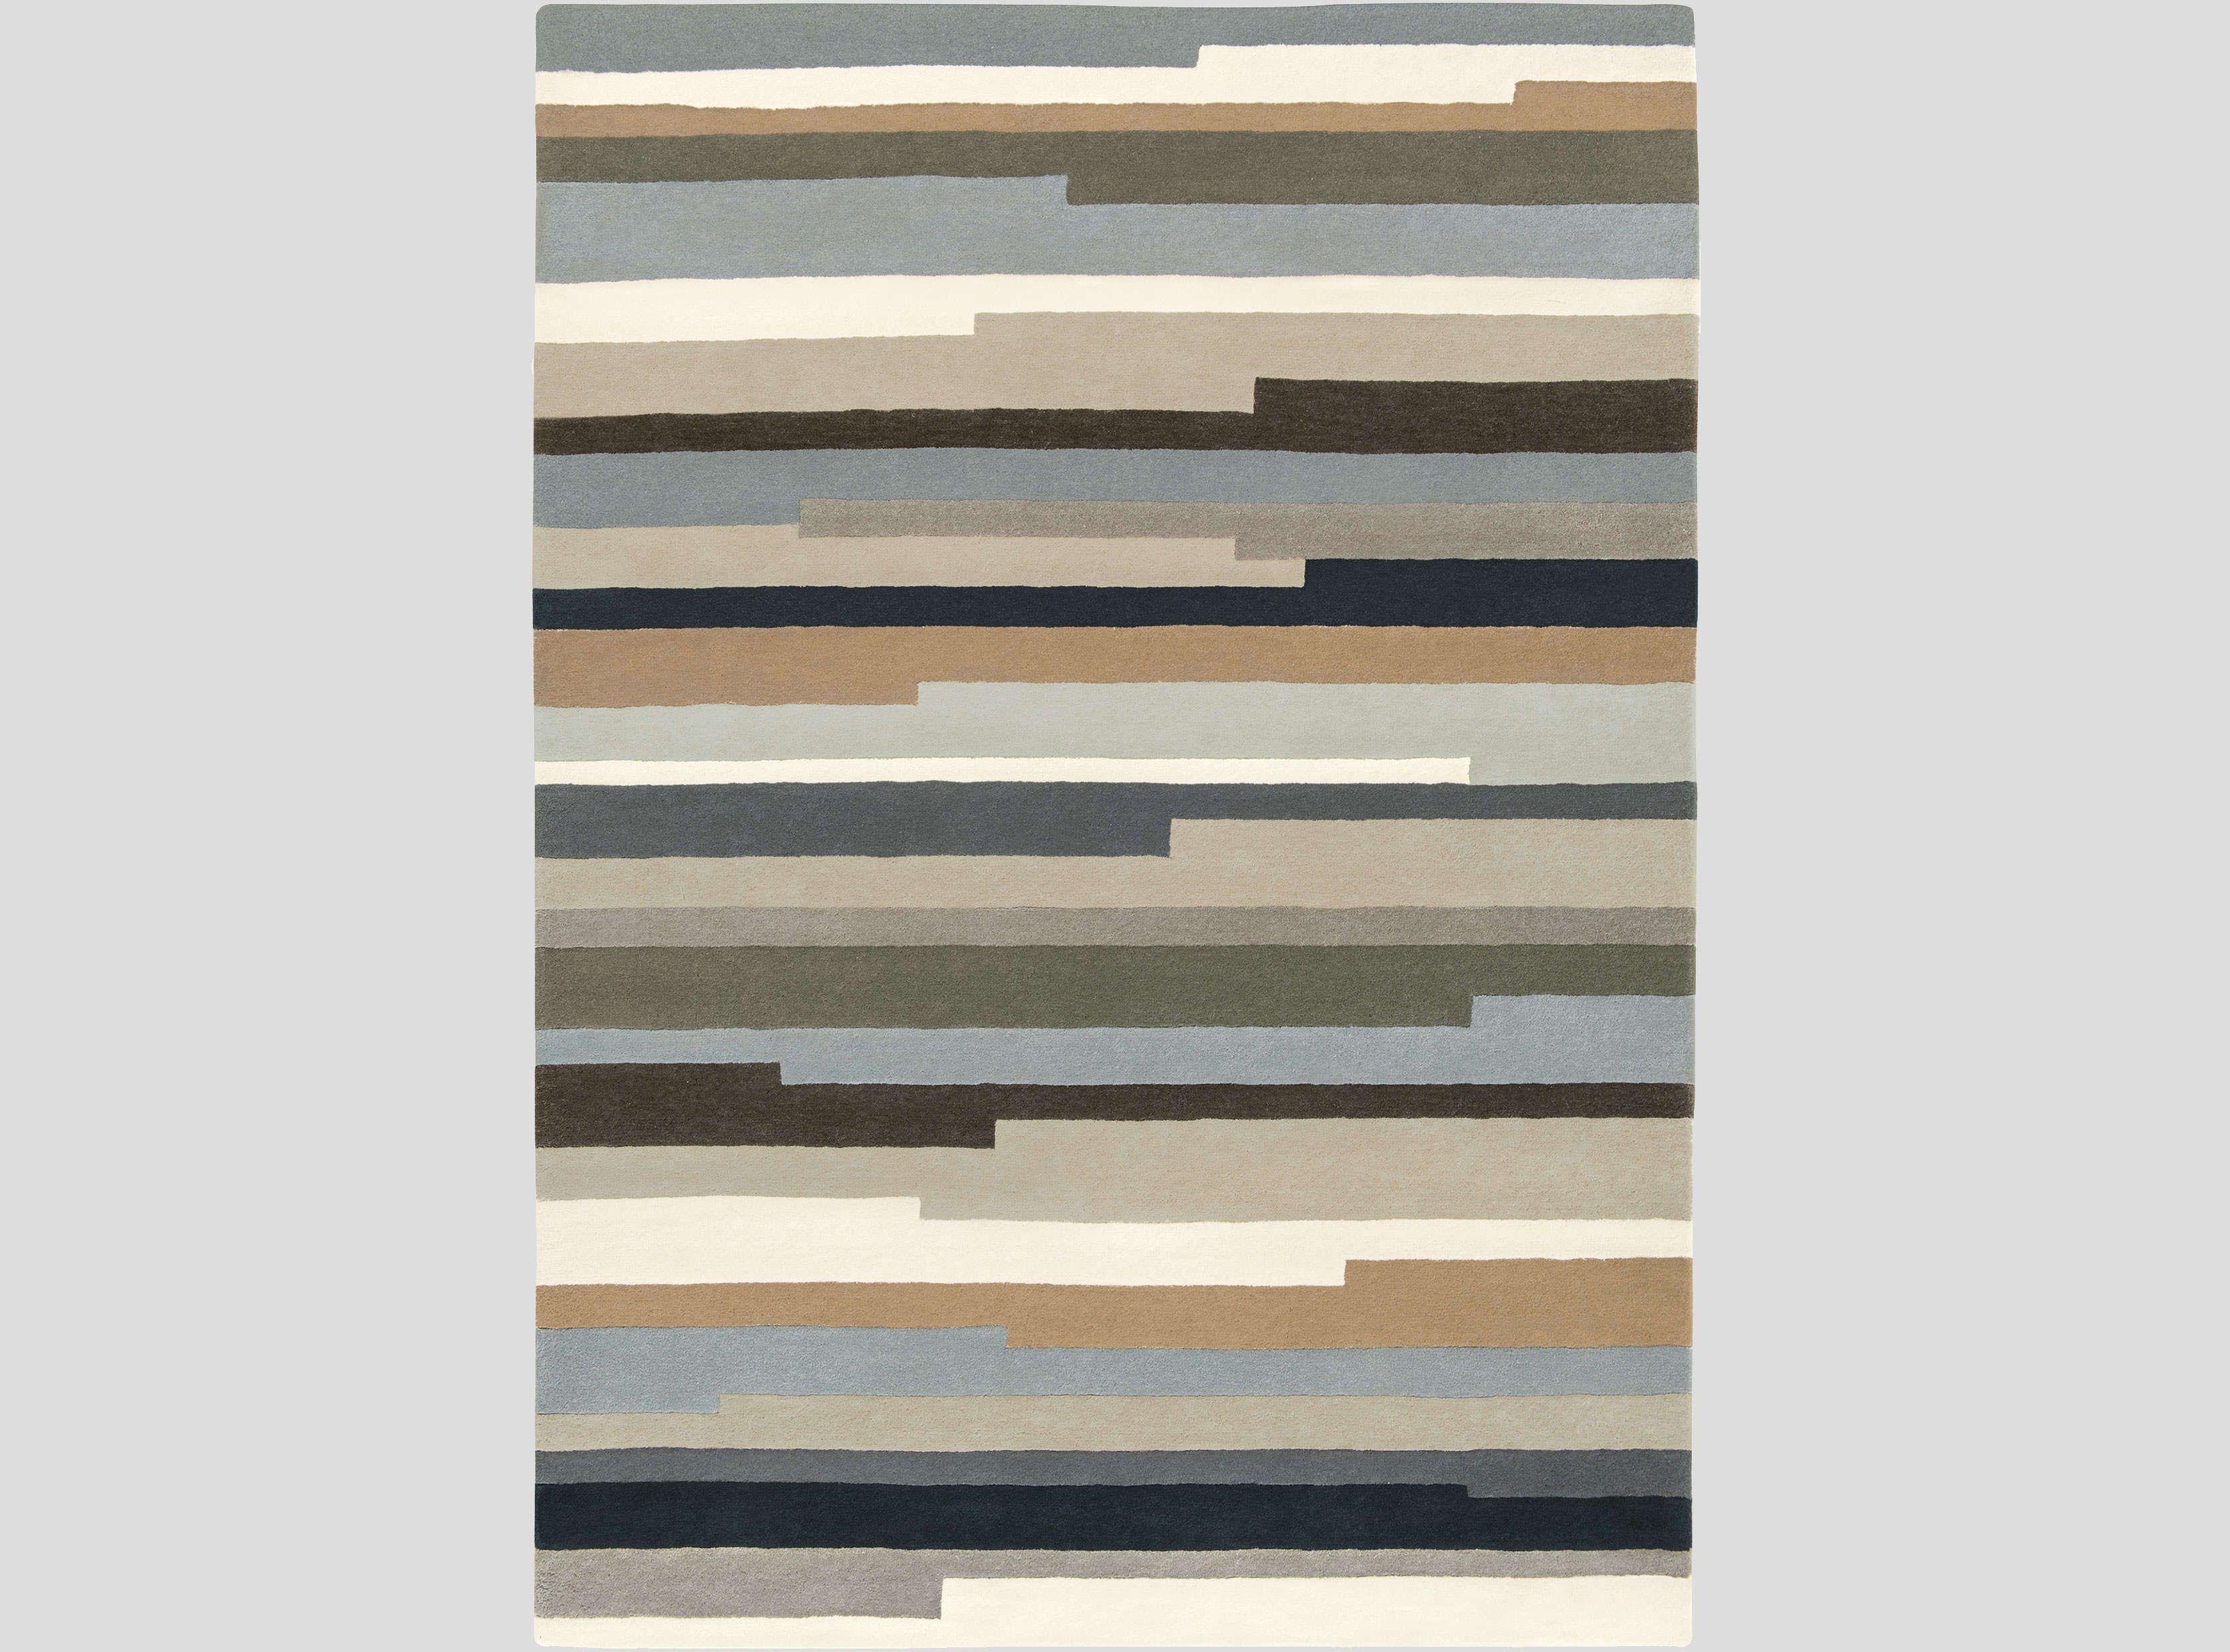 Hand Tufted Wool Rug Designer Fabrics Wallcoverings Upholstery Fabrics Upholstery Fabric Rugs Romo Fabrics